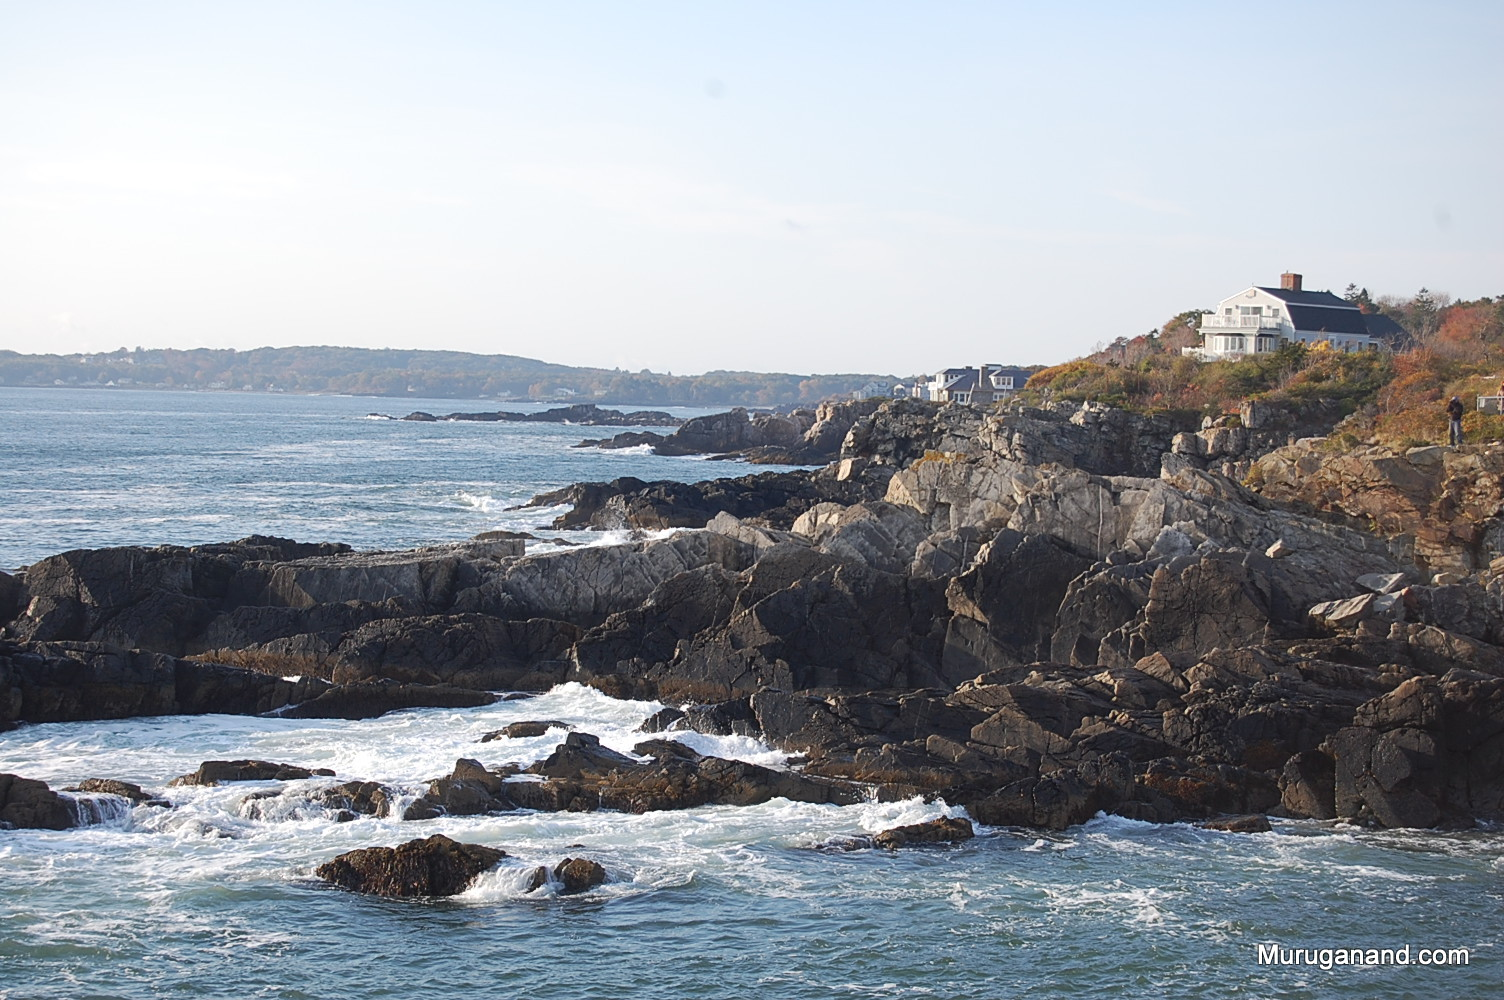 Granite rocks add charm to the shore.